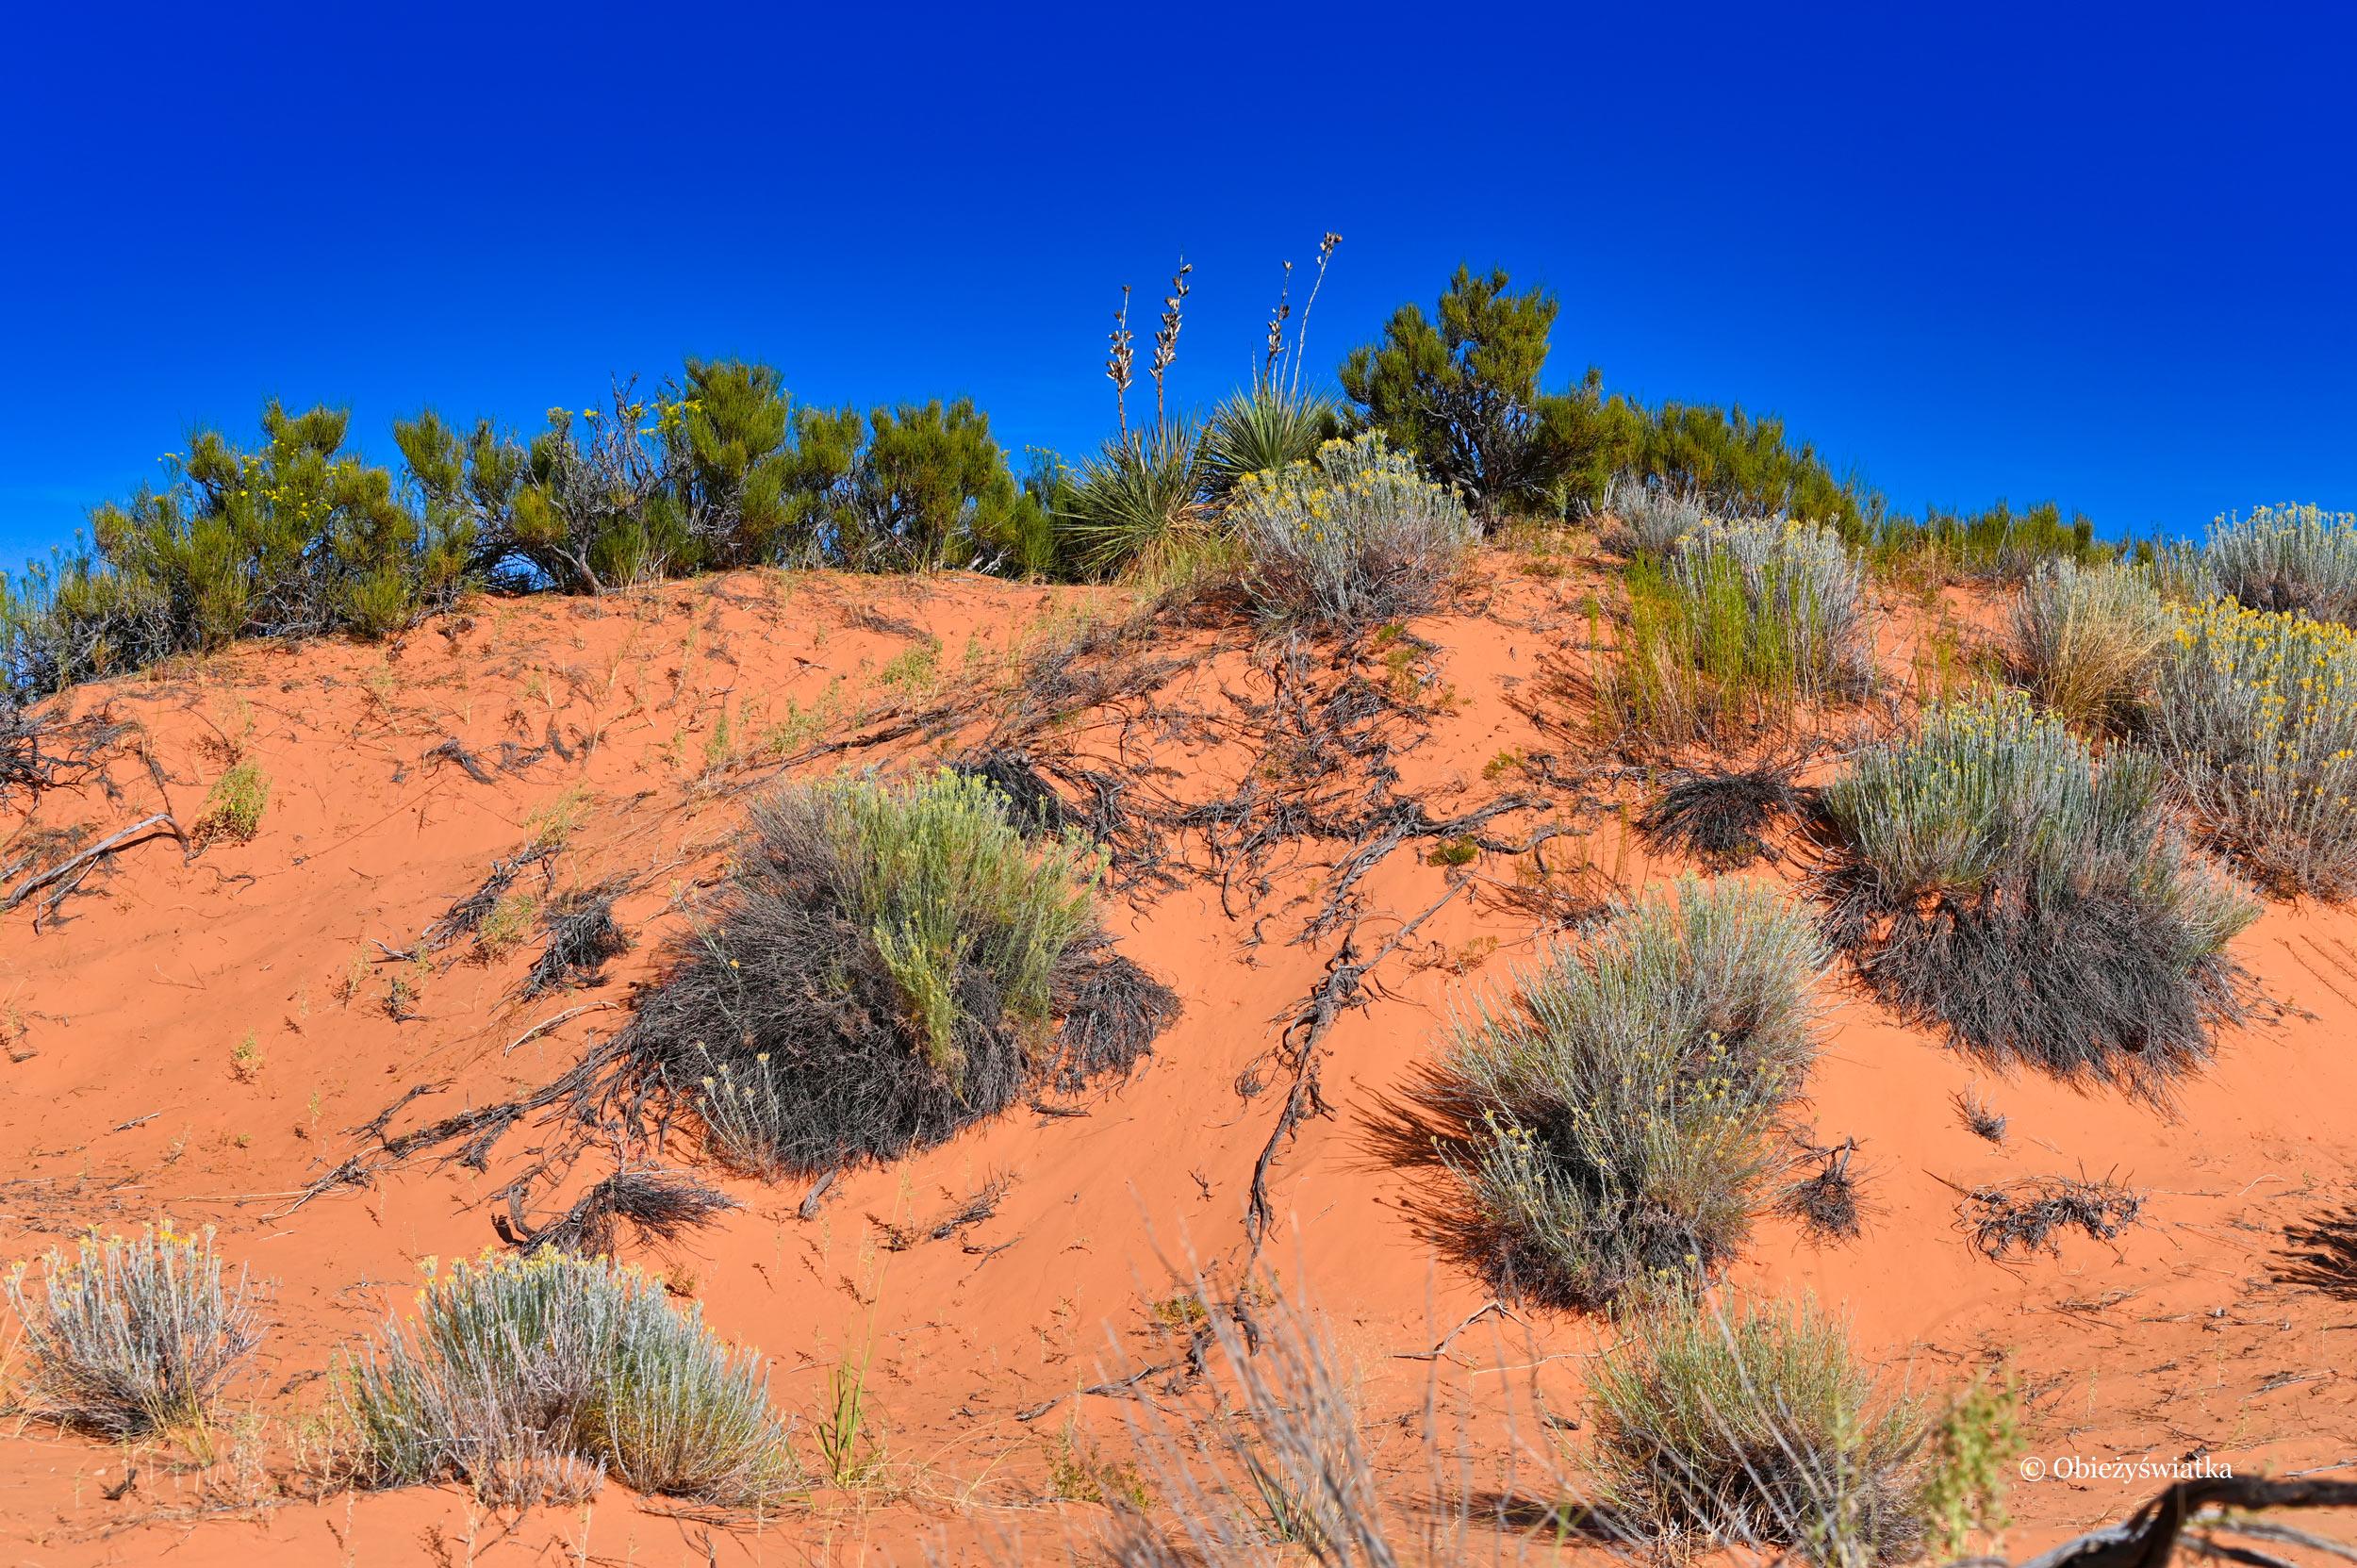 Błękit, pomarańcz i zieleń - Coral Pink Sand Dunes State Park, Utah